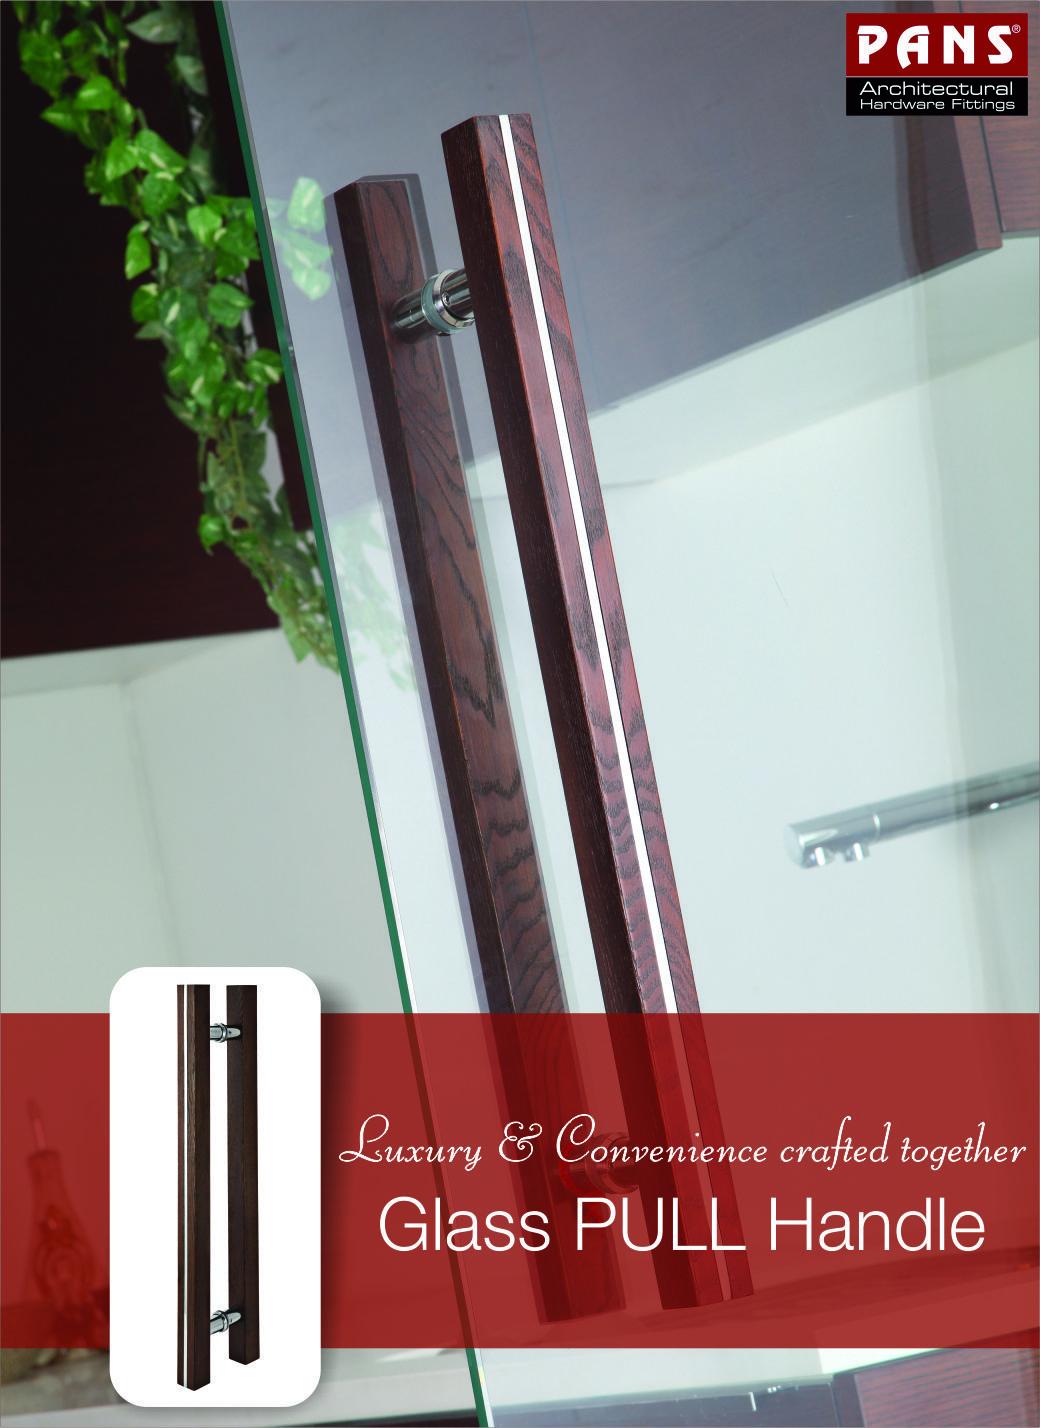 Glass Pull Handle #wardrobe #kitchen #bedroom #window #hinges #pans # & Glass Pull Handle #wardrobe #kitchen #bedroom #window #hinges #pans ...